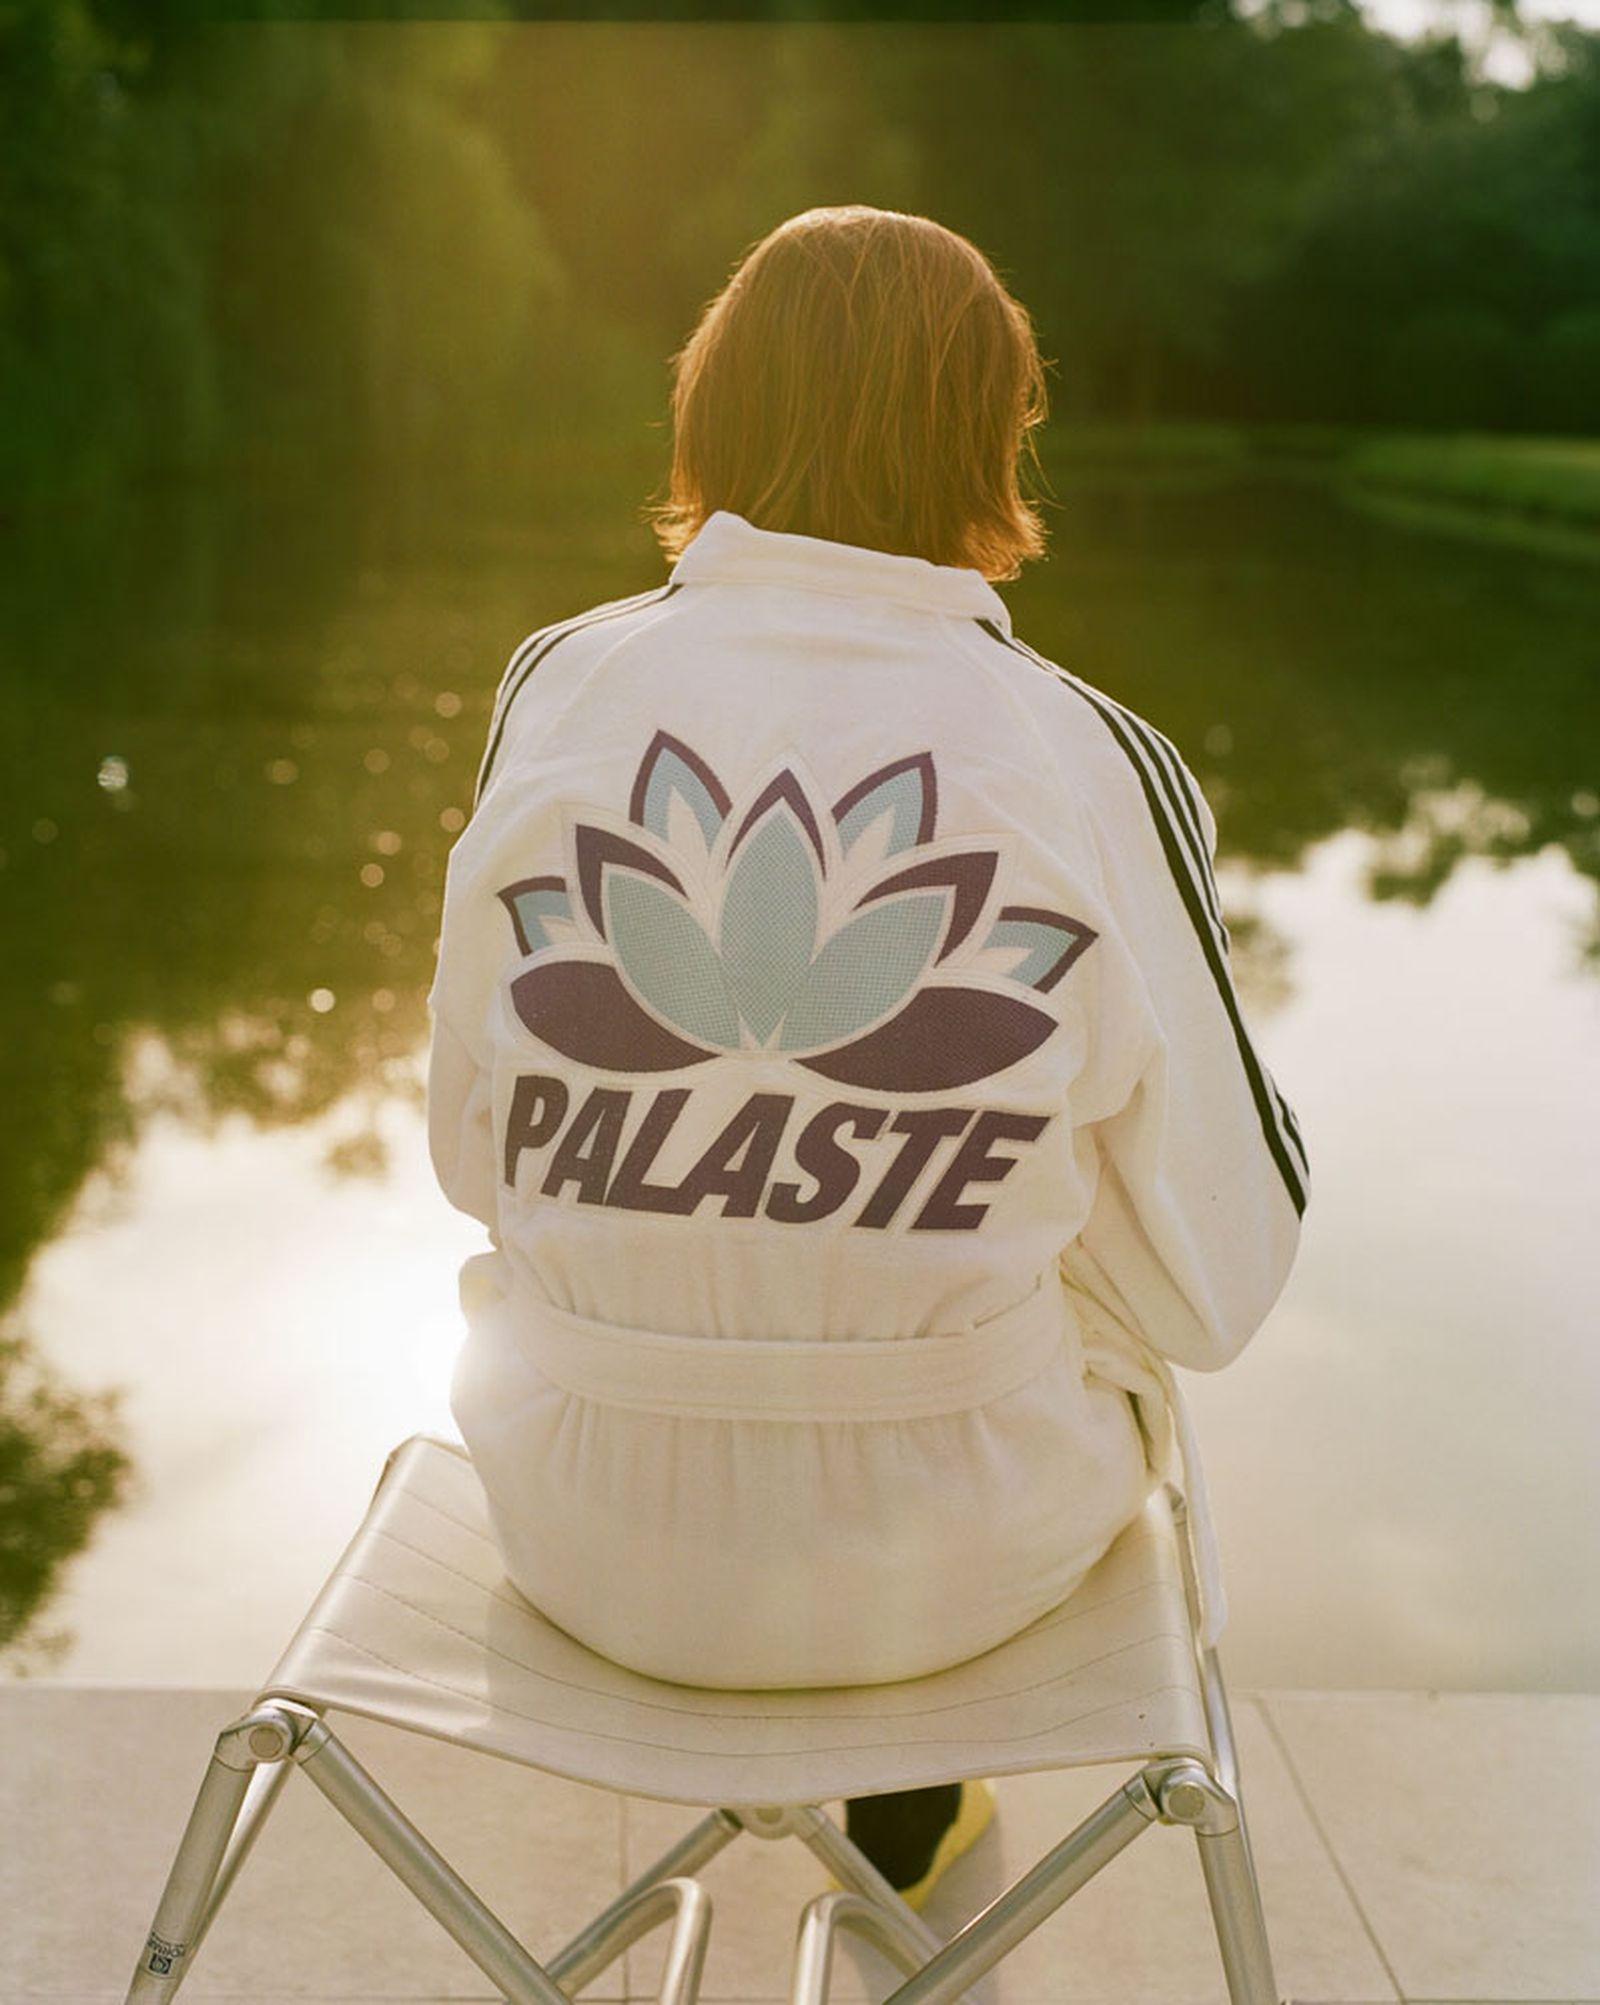 even-palace-x-adidas-wellness-now-010